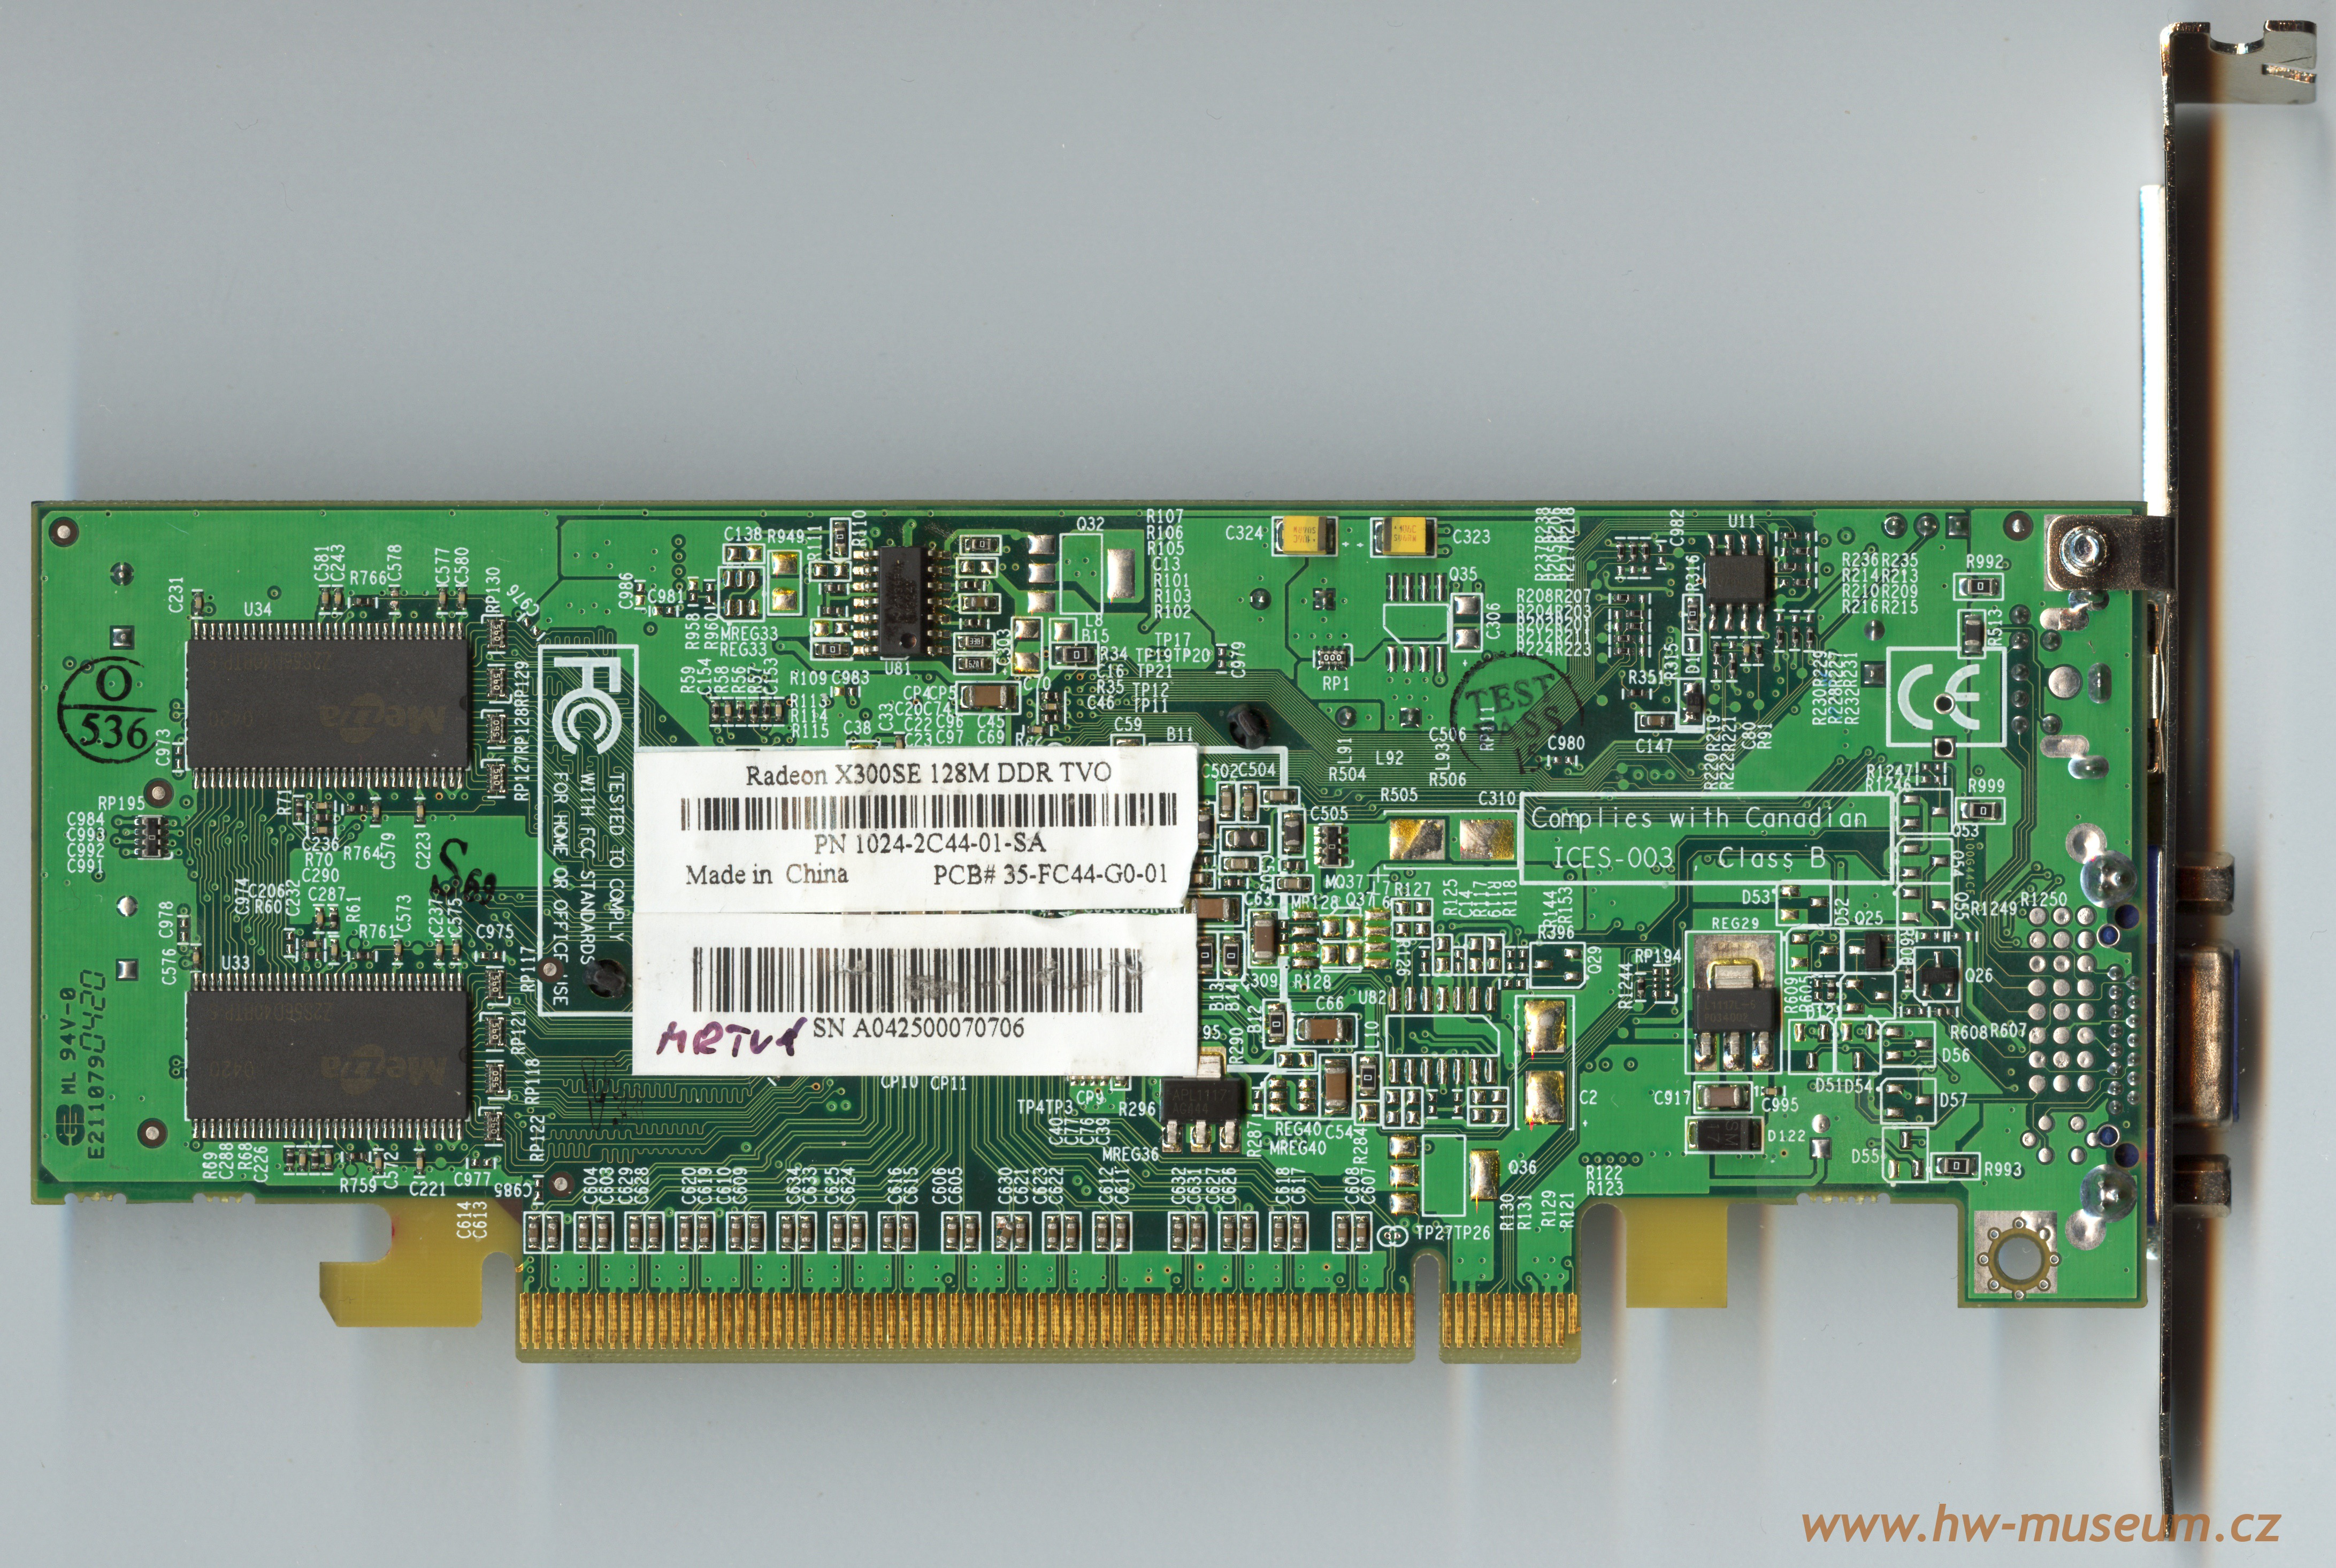 Sapphire RADEON X300 - graphics card - Radeon X300 - 128 MB Specs